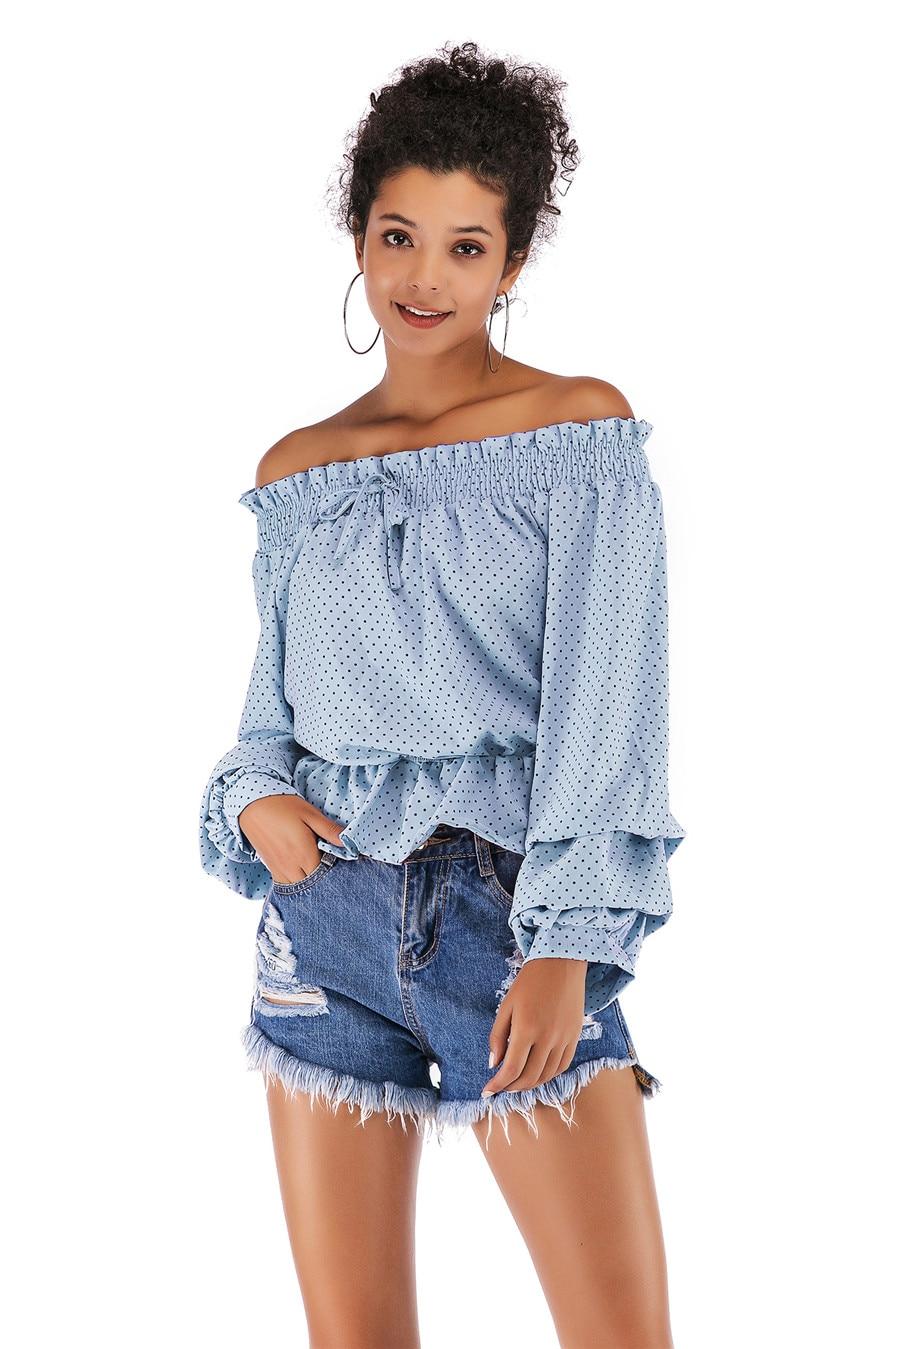 Gladiolus Chiffon Blouse Women 2019 Spring Autumn Long Sleeve Polka Dot Off Shoulder Sexy Blouses Women Shirts Ruffles Blusas (17)